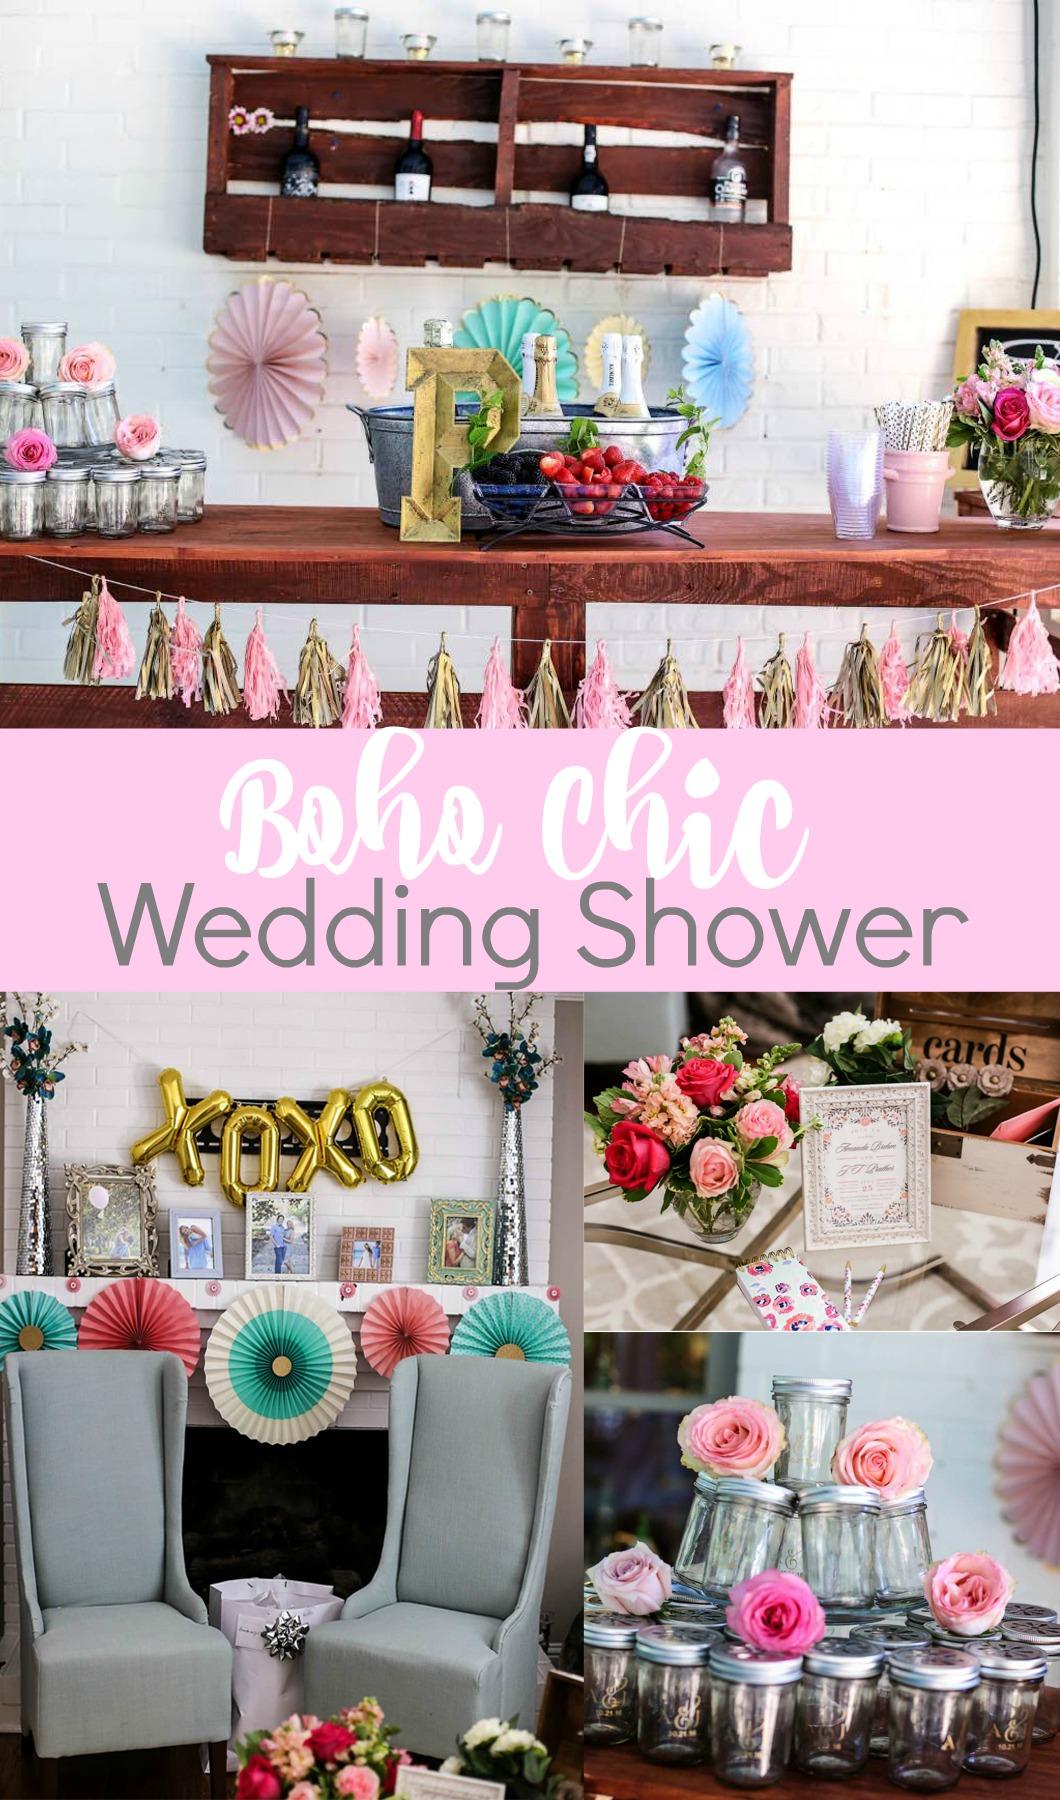 Boho Chic Wedding Shower